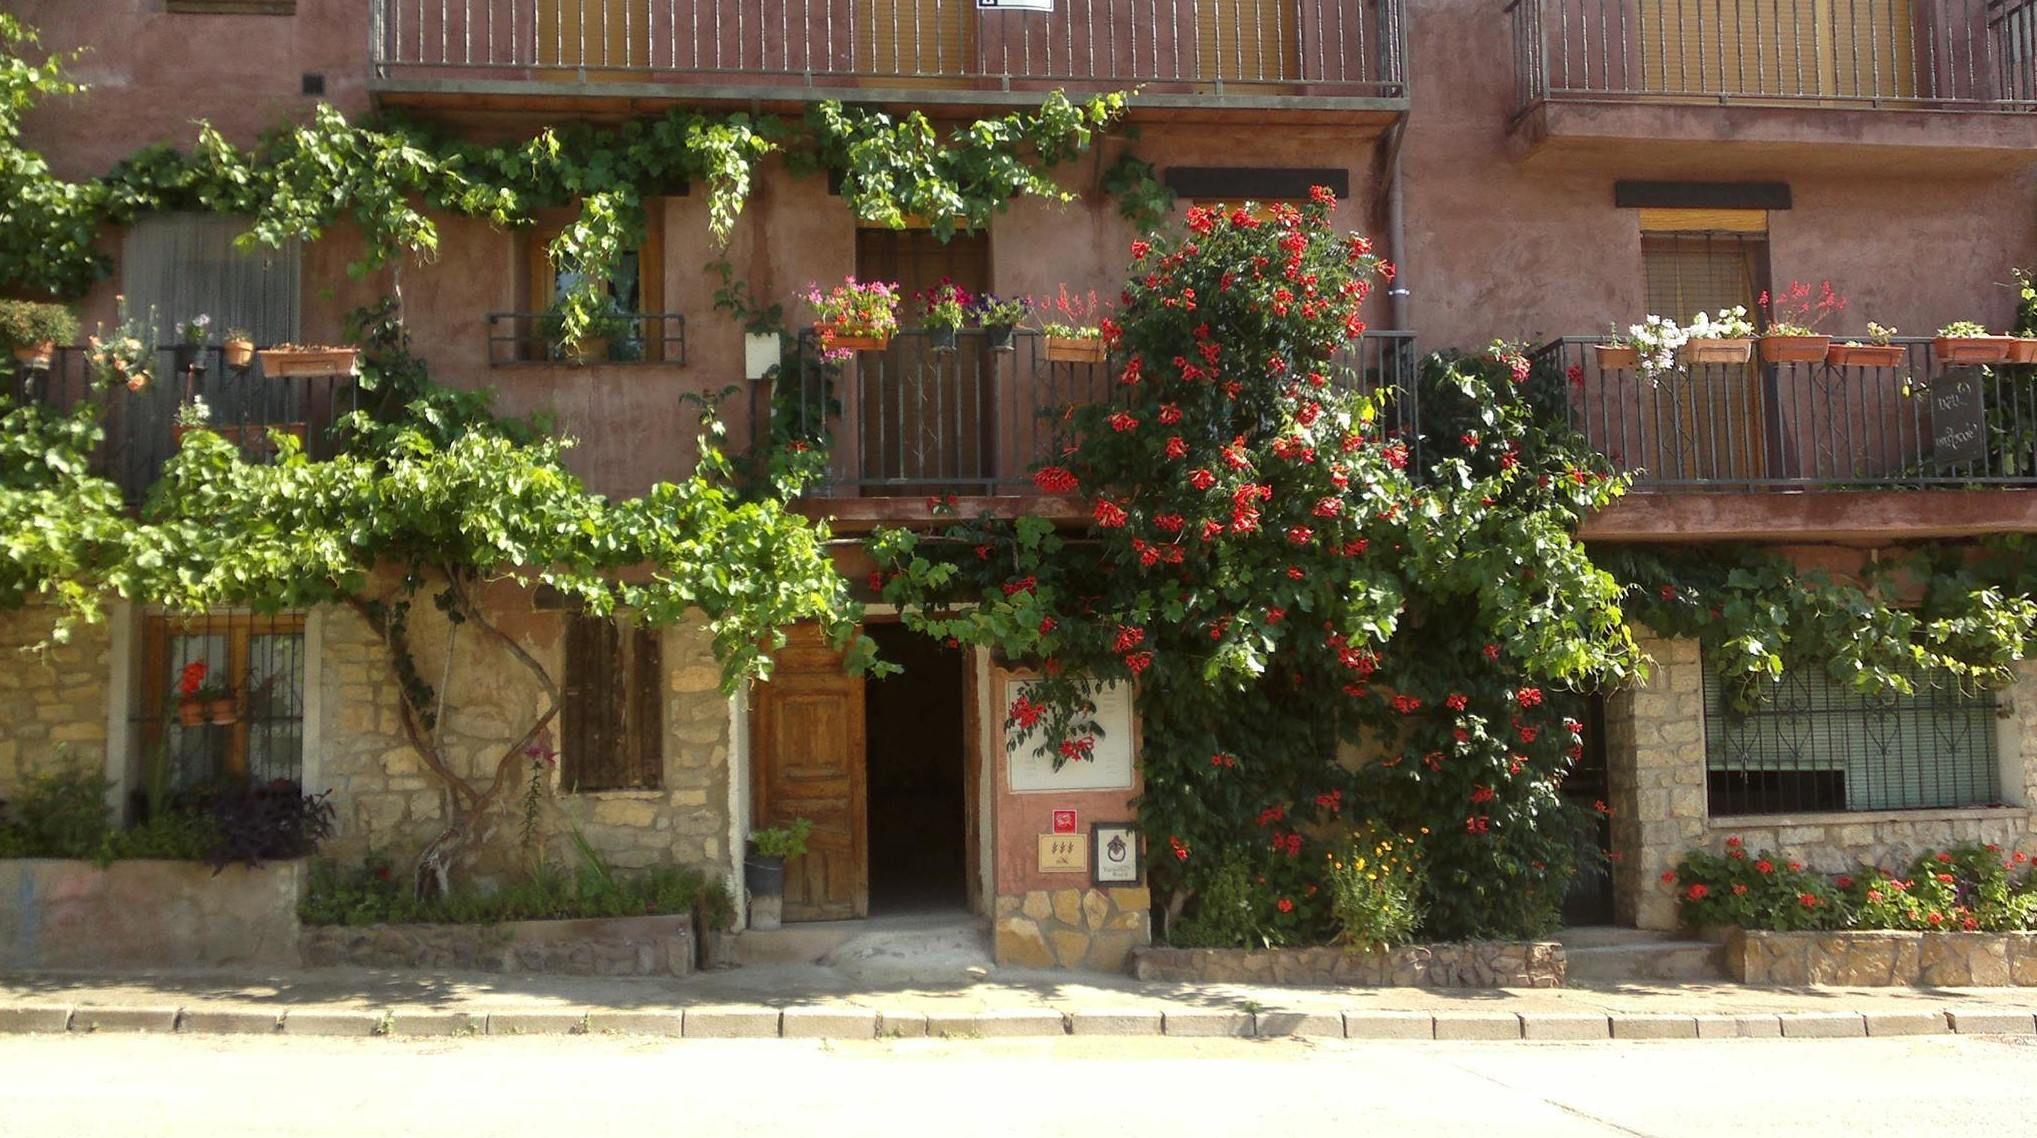 Tarifas: La Casa Josefina de Casa Josefina